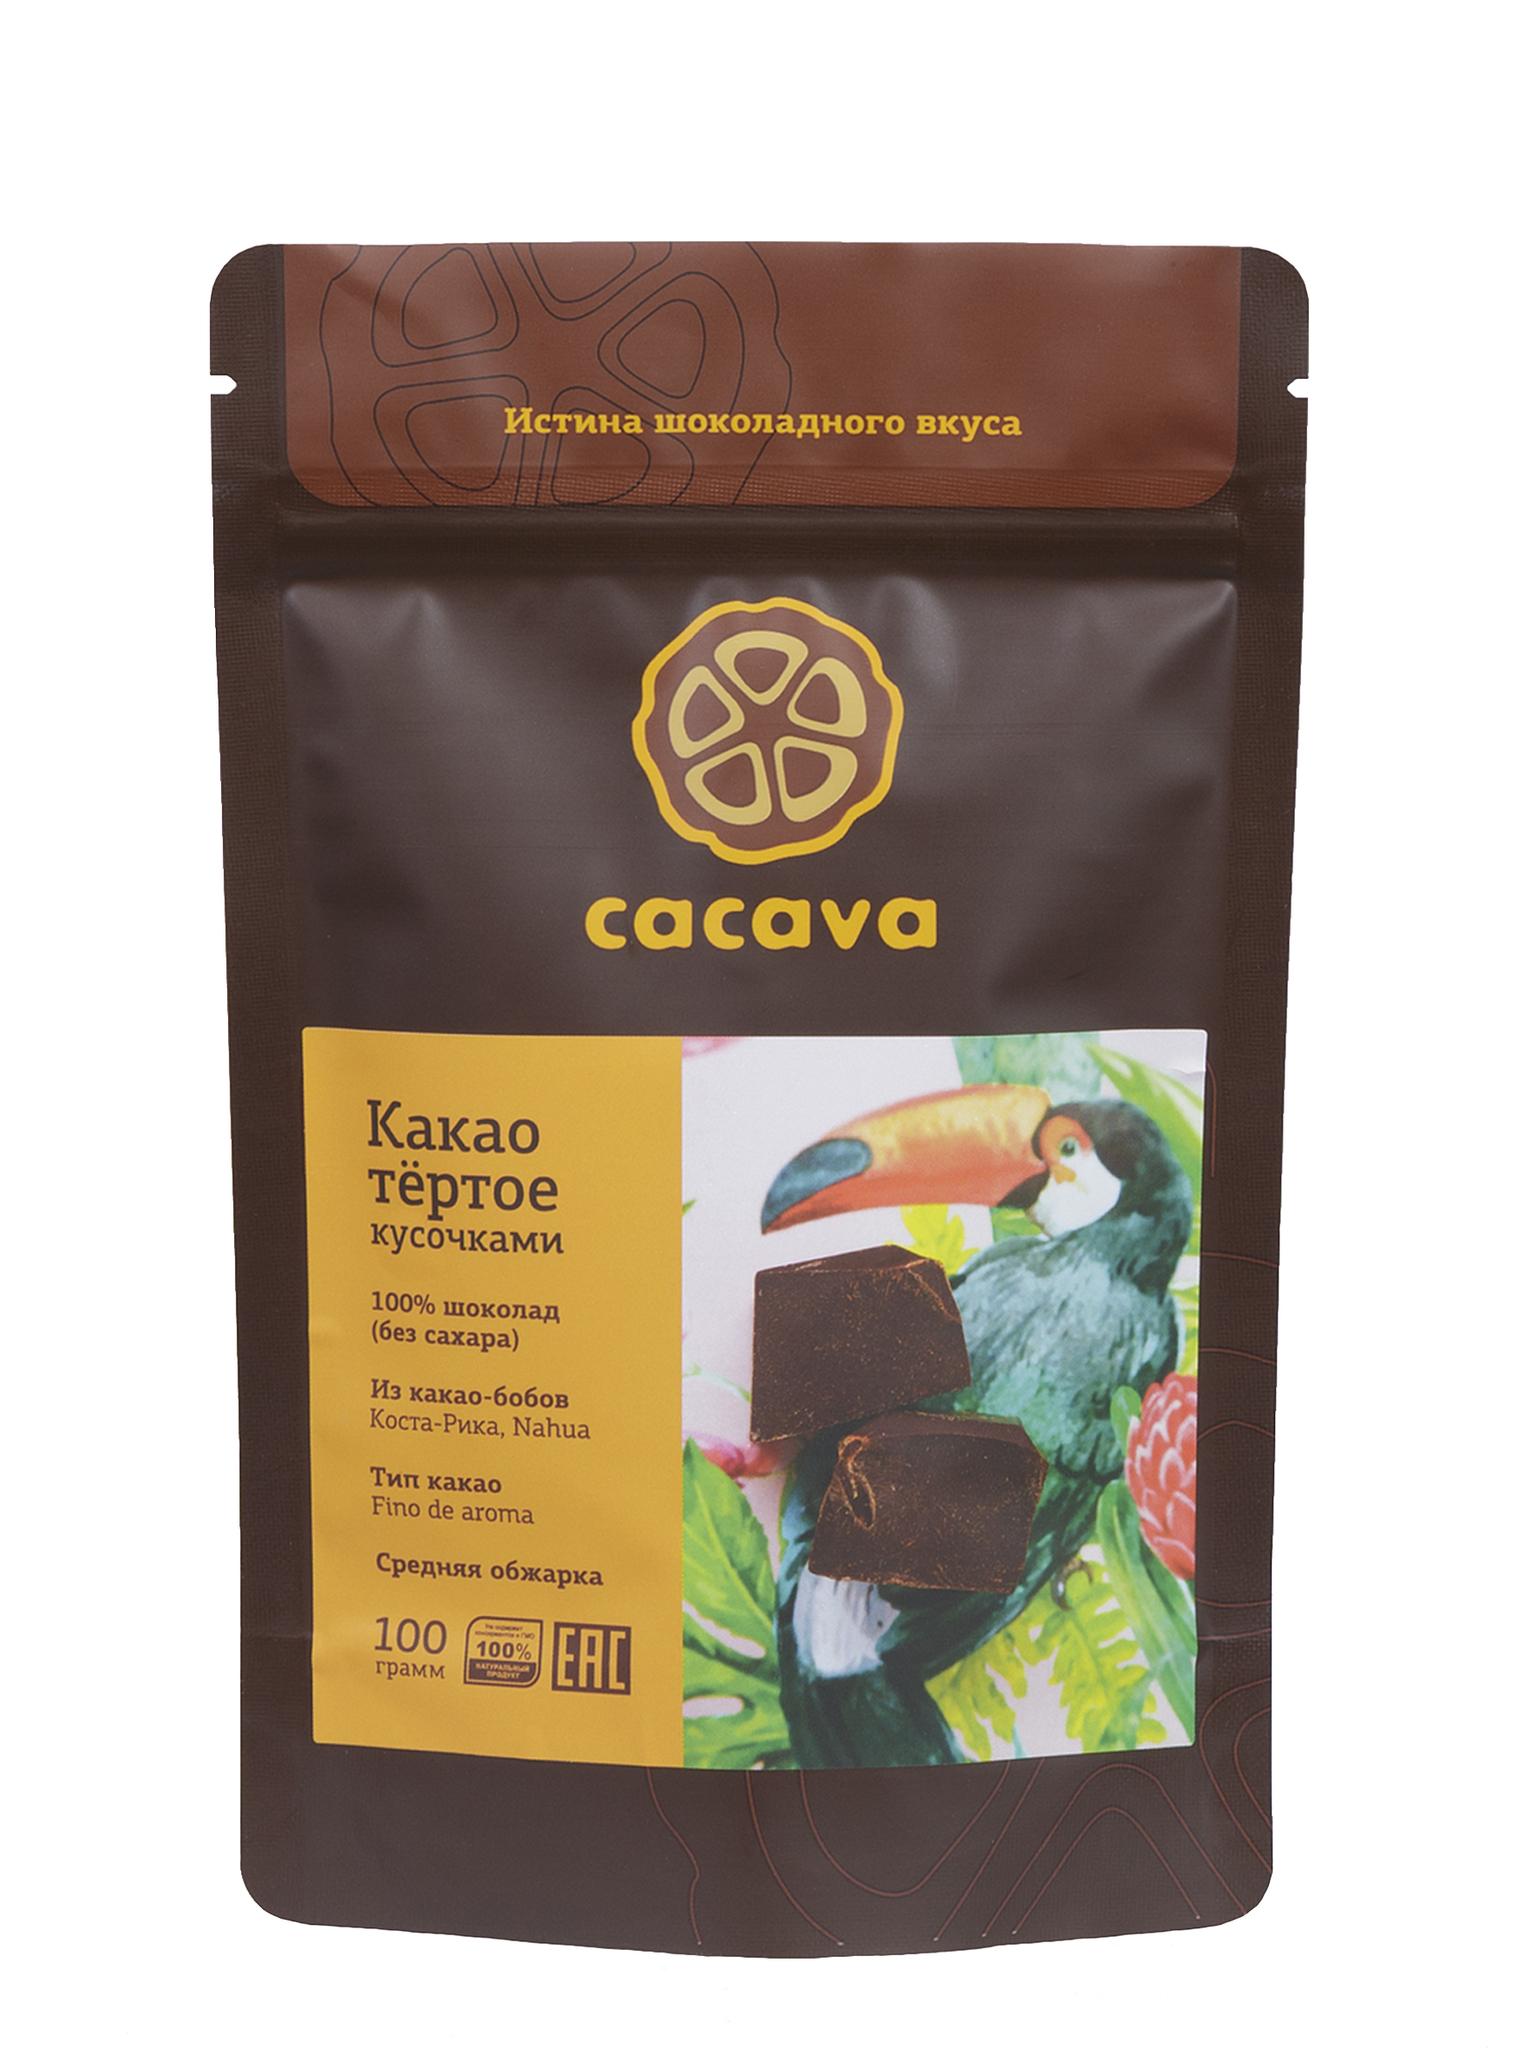 Какао тёртое кусочками (Коста-Рика), упаковка 100 грамм